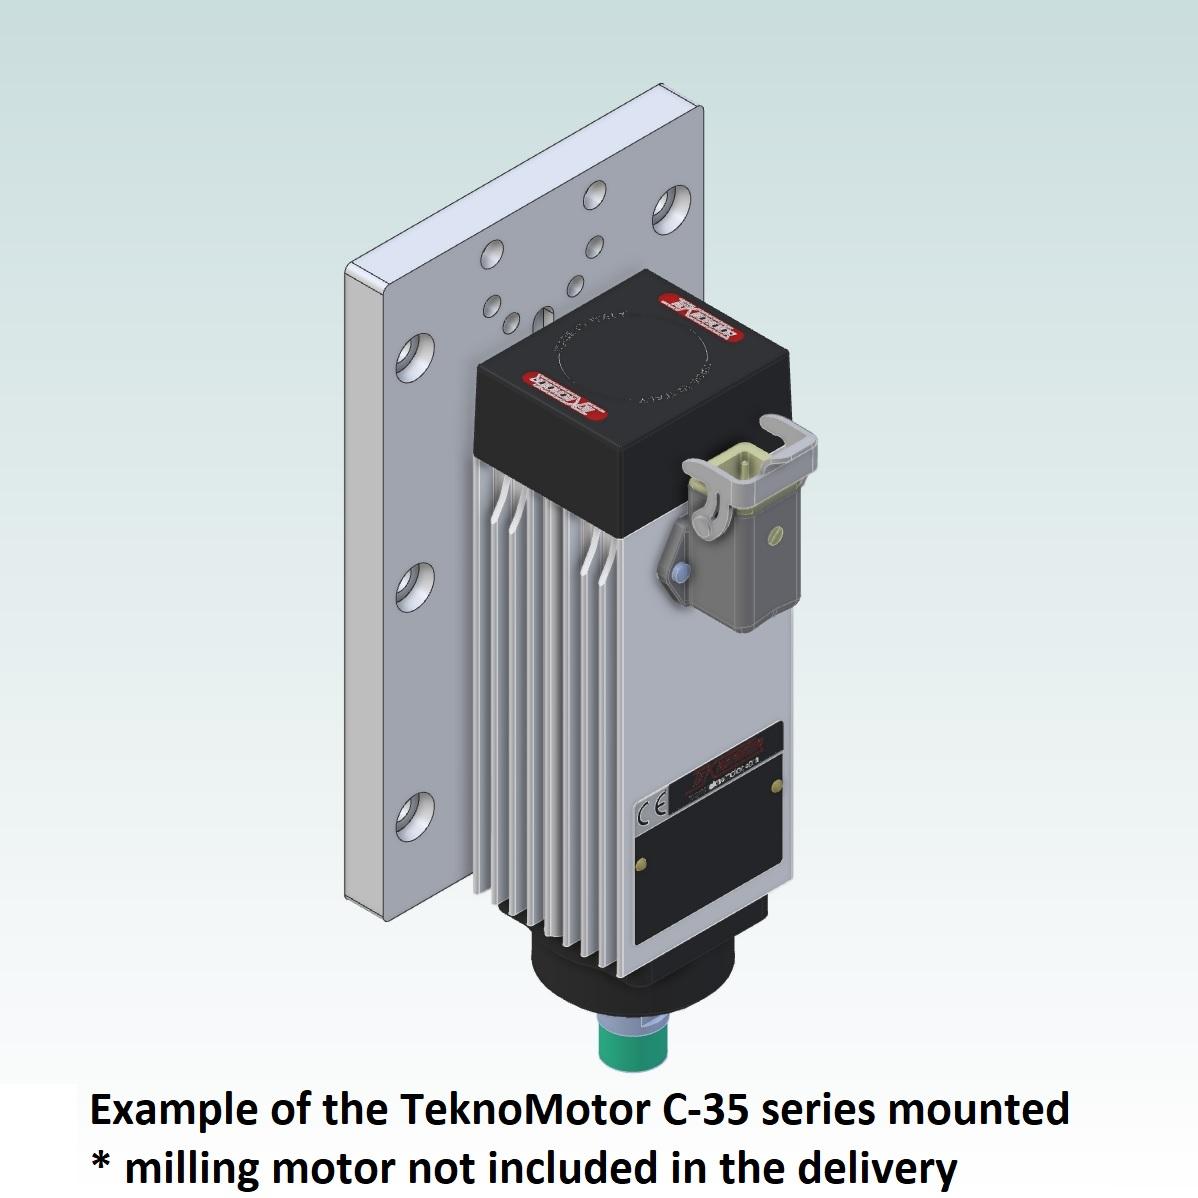 42717 teknomotor mountingplate icp4030 example with teknomotor c35 06kw